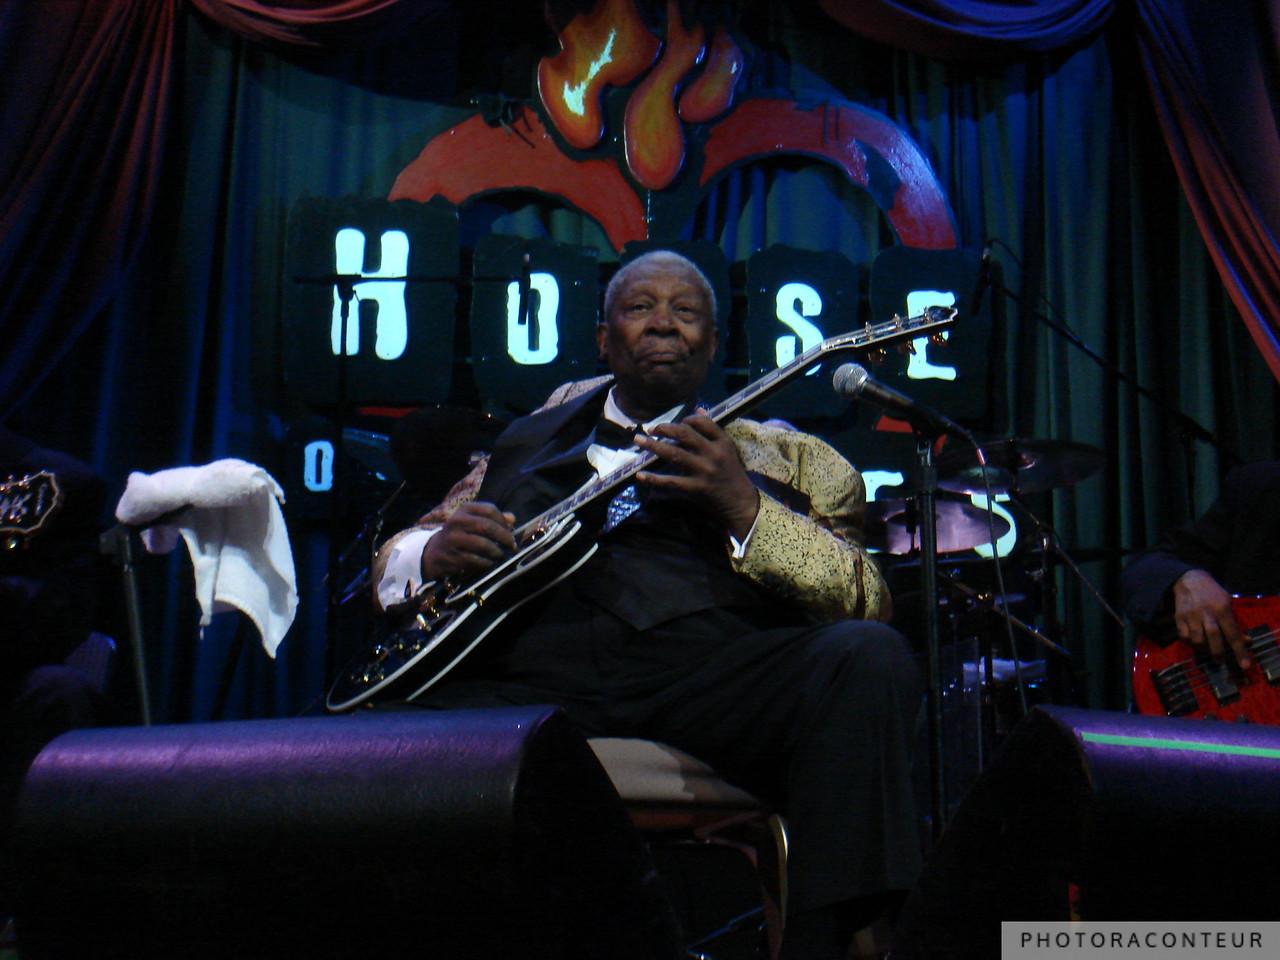 B.B. King performing at the House of Blues in Las Vegas, May 2009  (Photo by Benjamin Padgett)